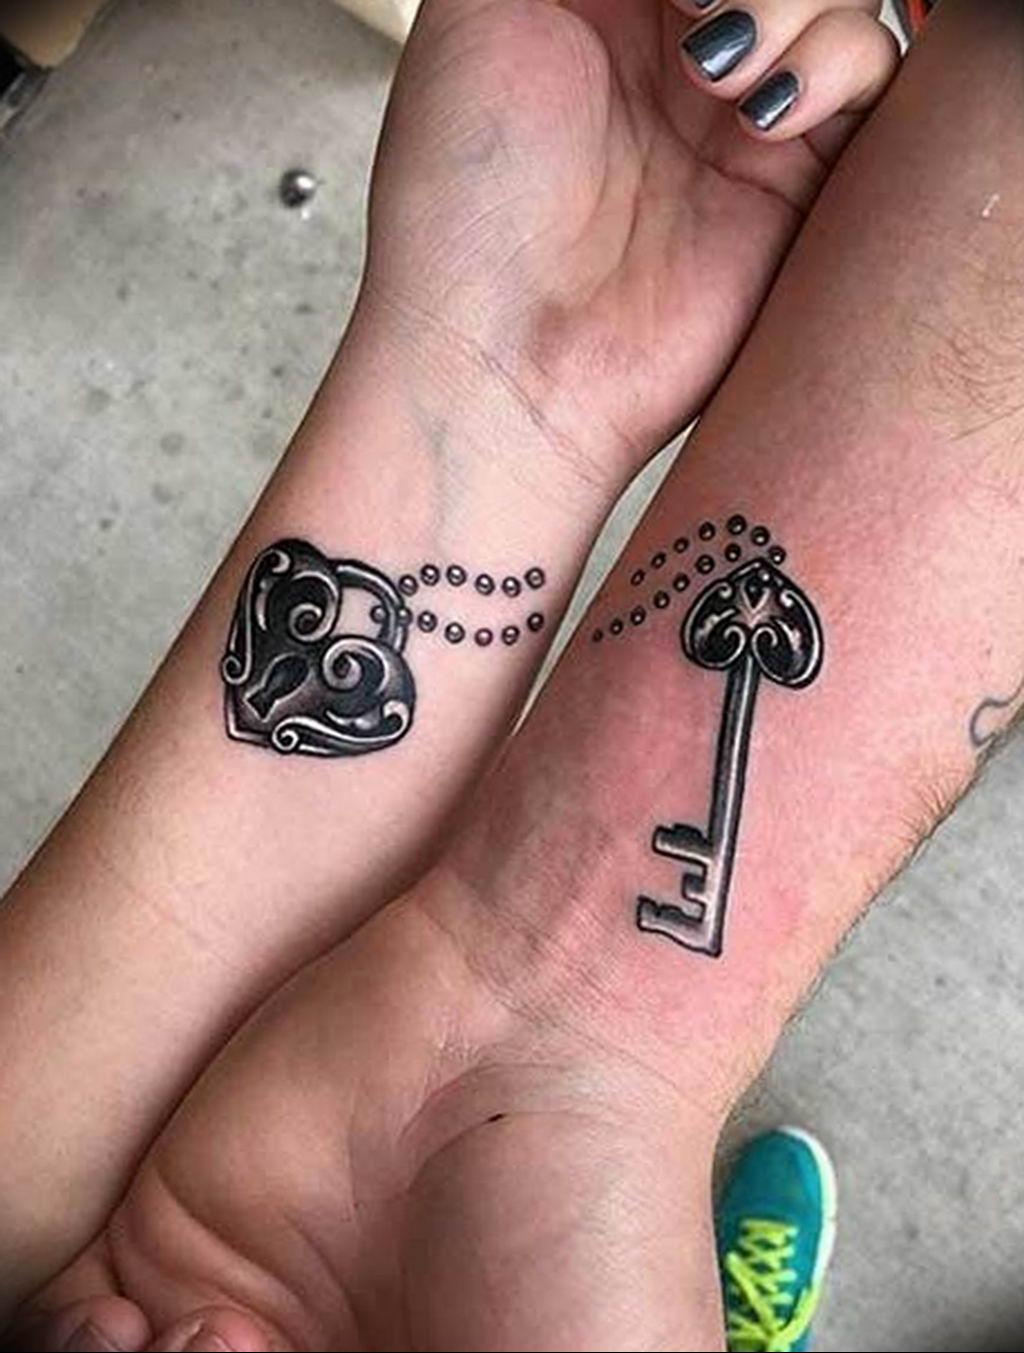 Фото тату ключ на запястье 21.08.2019 №043 - tattoo key on the wrist - tatufoto.com